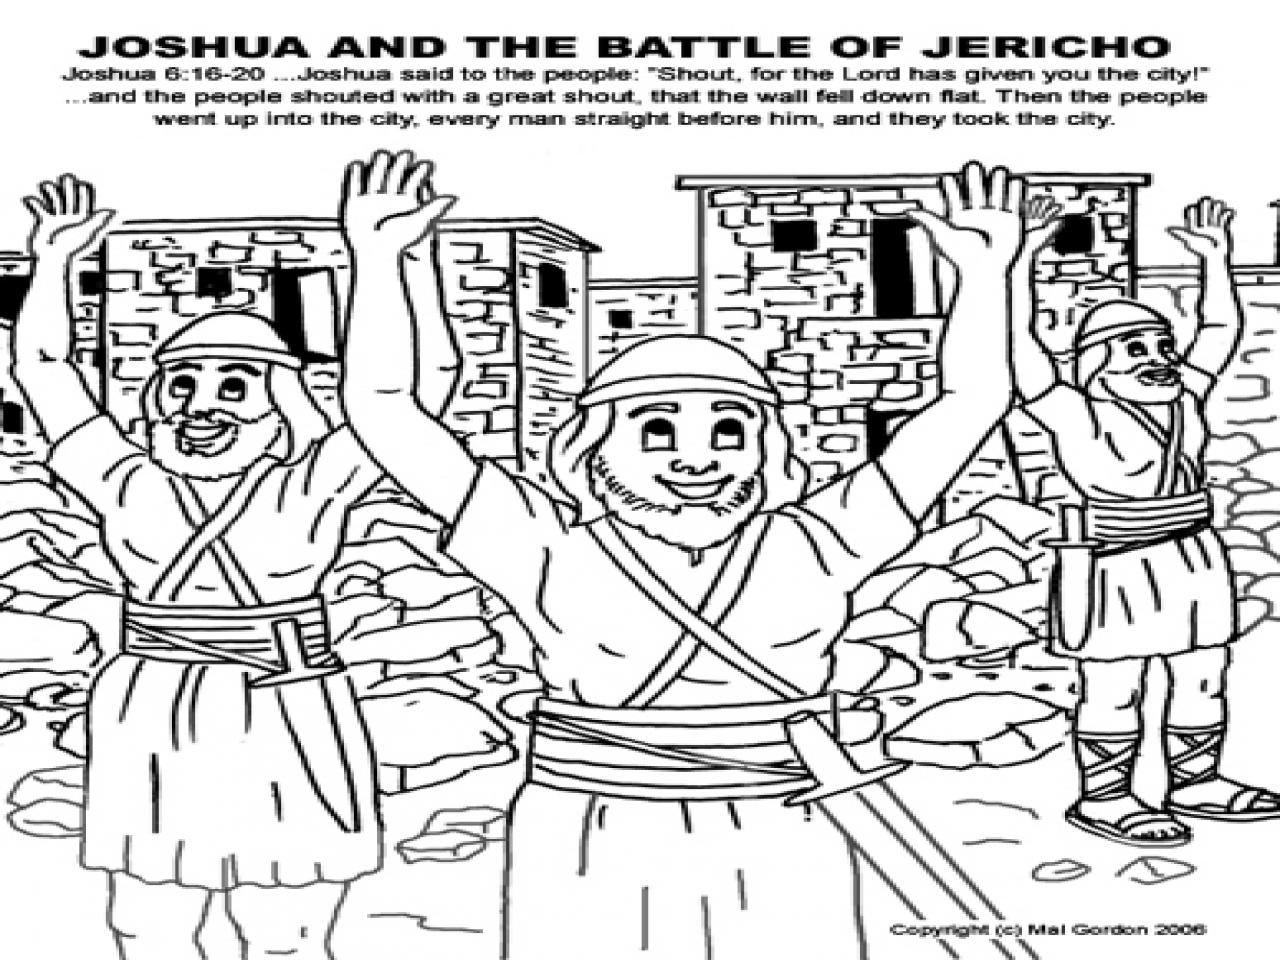 Joshua Fought The Battle Of Jericho Coloring Page 15 Joshua And Jericho Coloring Pages Sunday School Attendance Chart